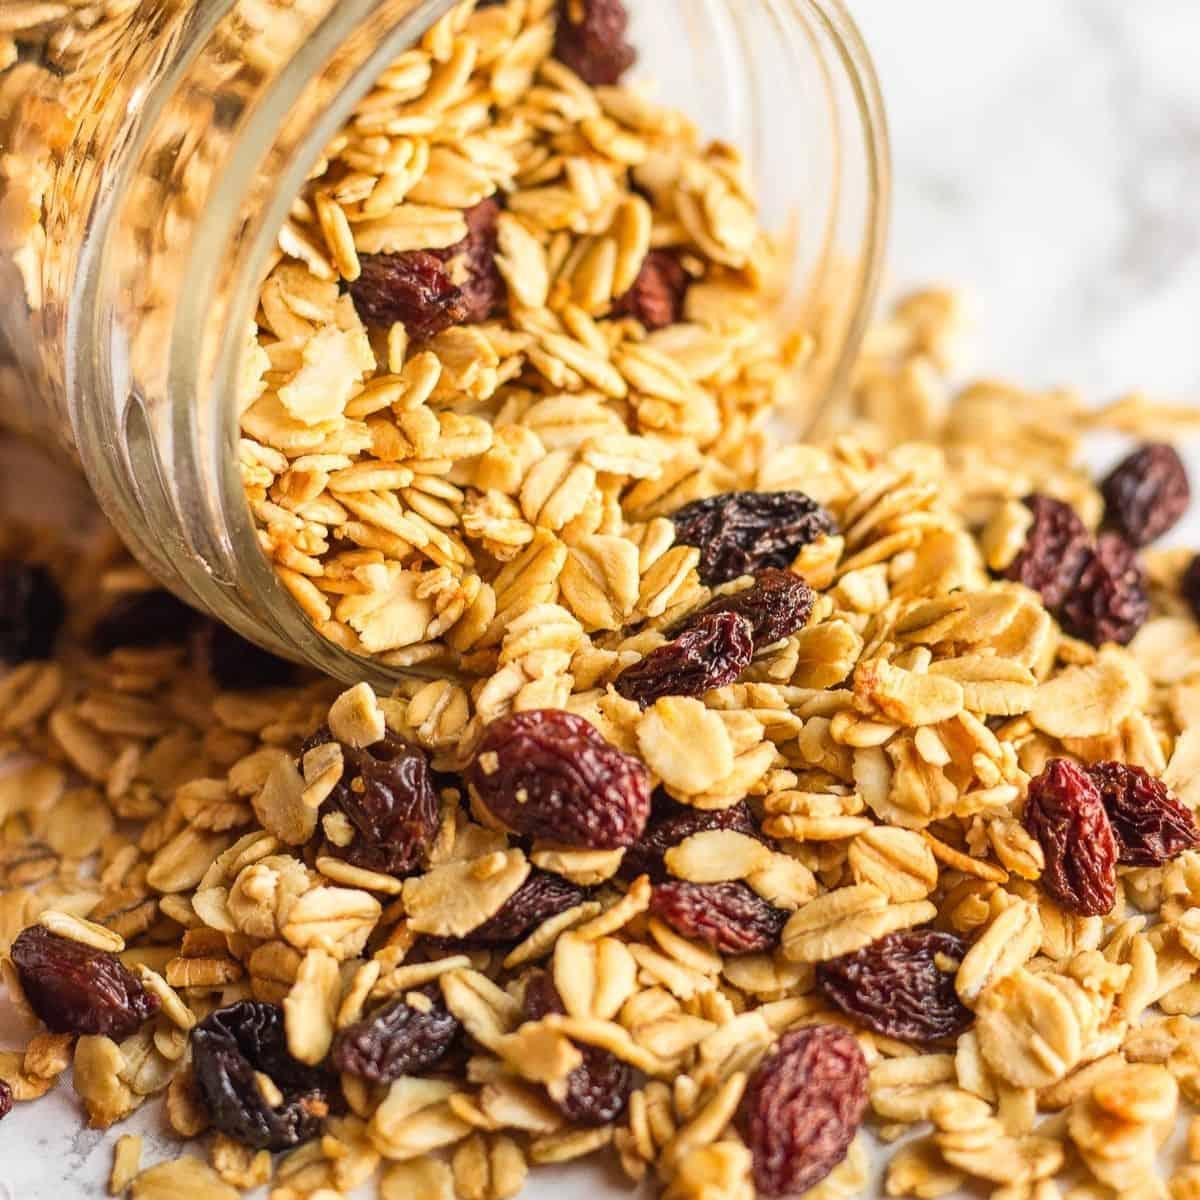 Simple Granola Recipe With Coconut Oil Raisins Lavender Macarons